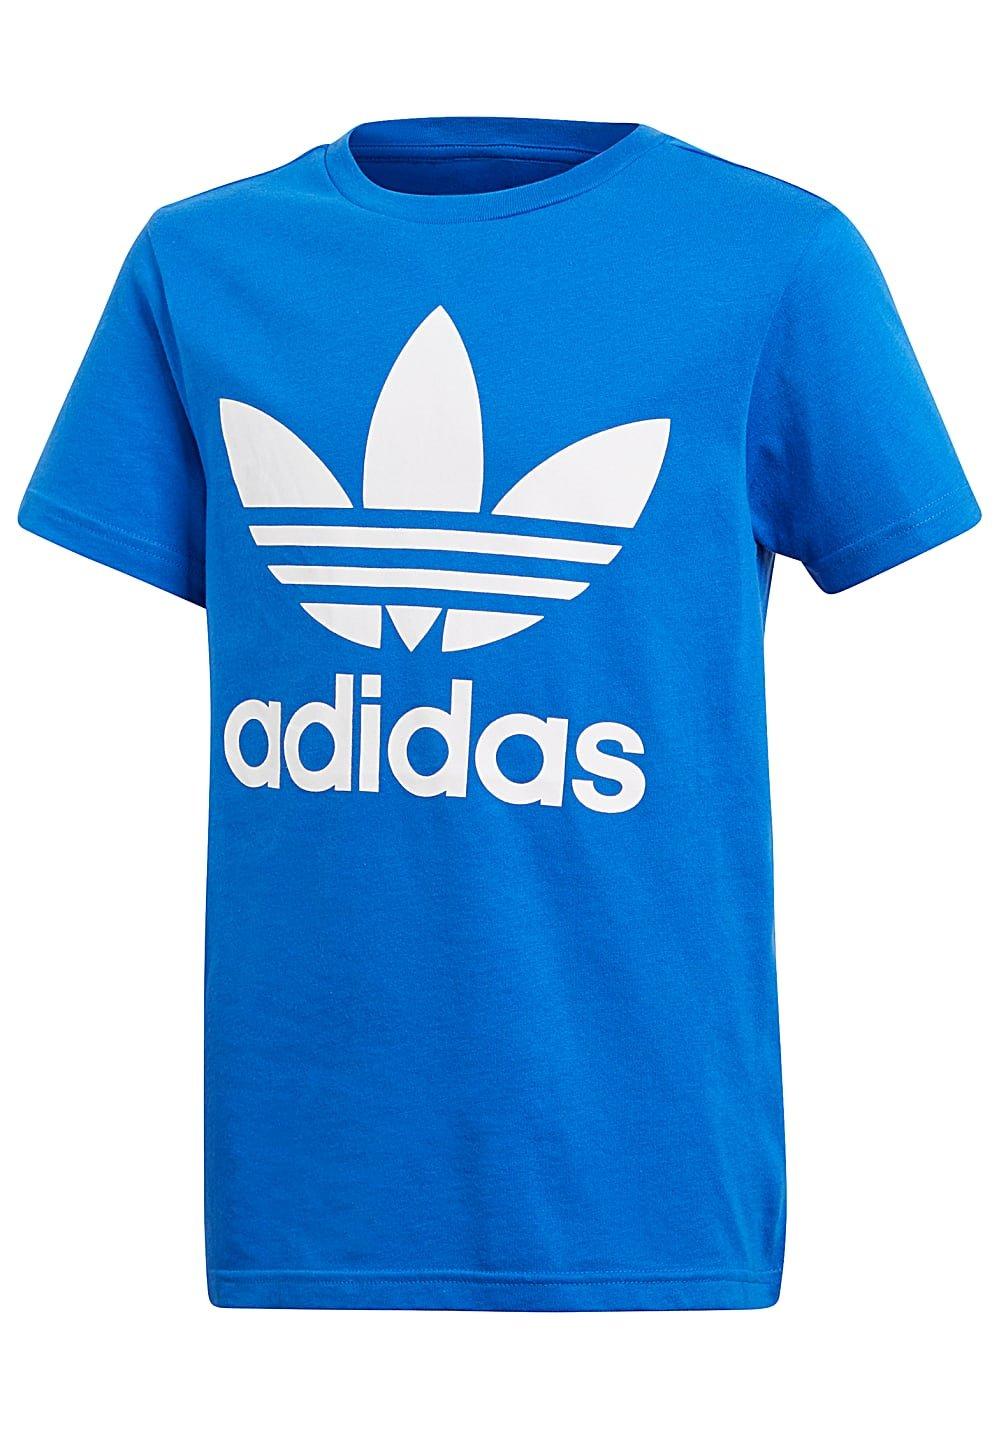 adidas Children's Trefoil T-Shirt ADIEY #adidas